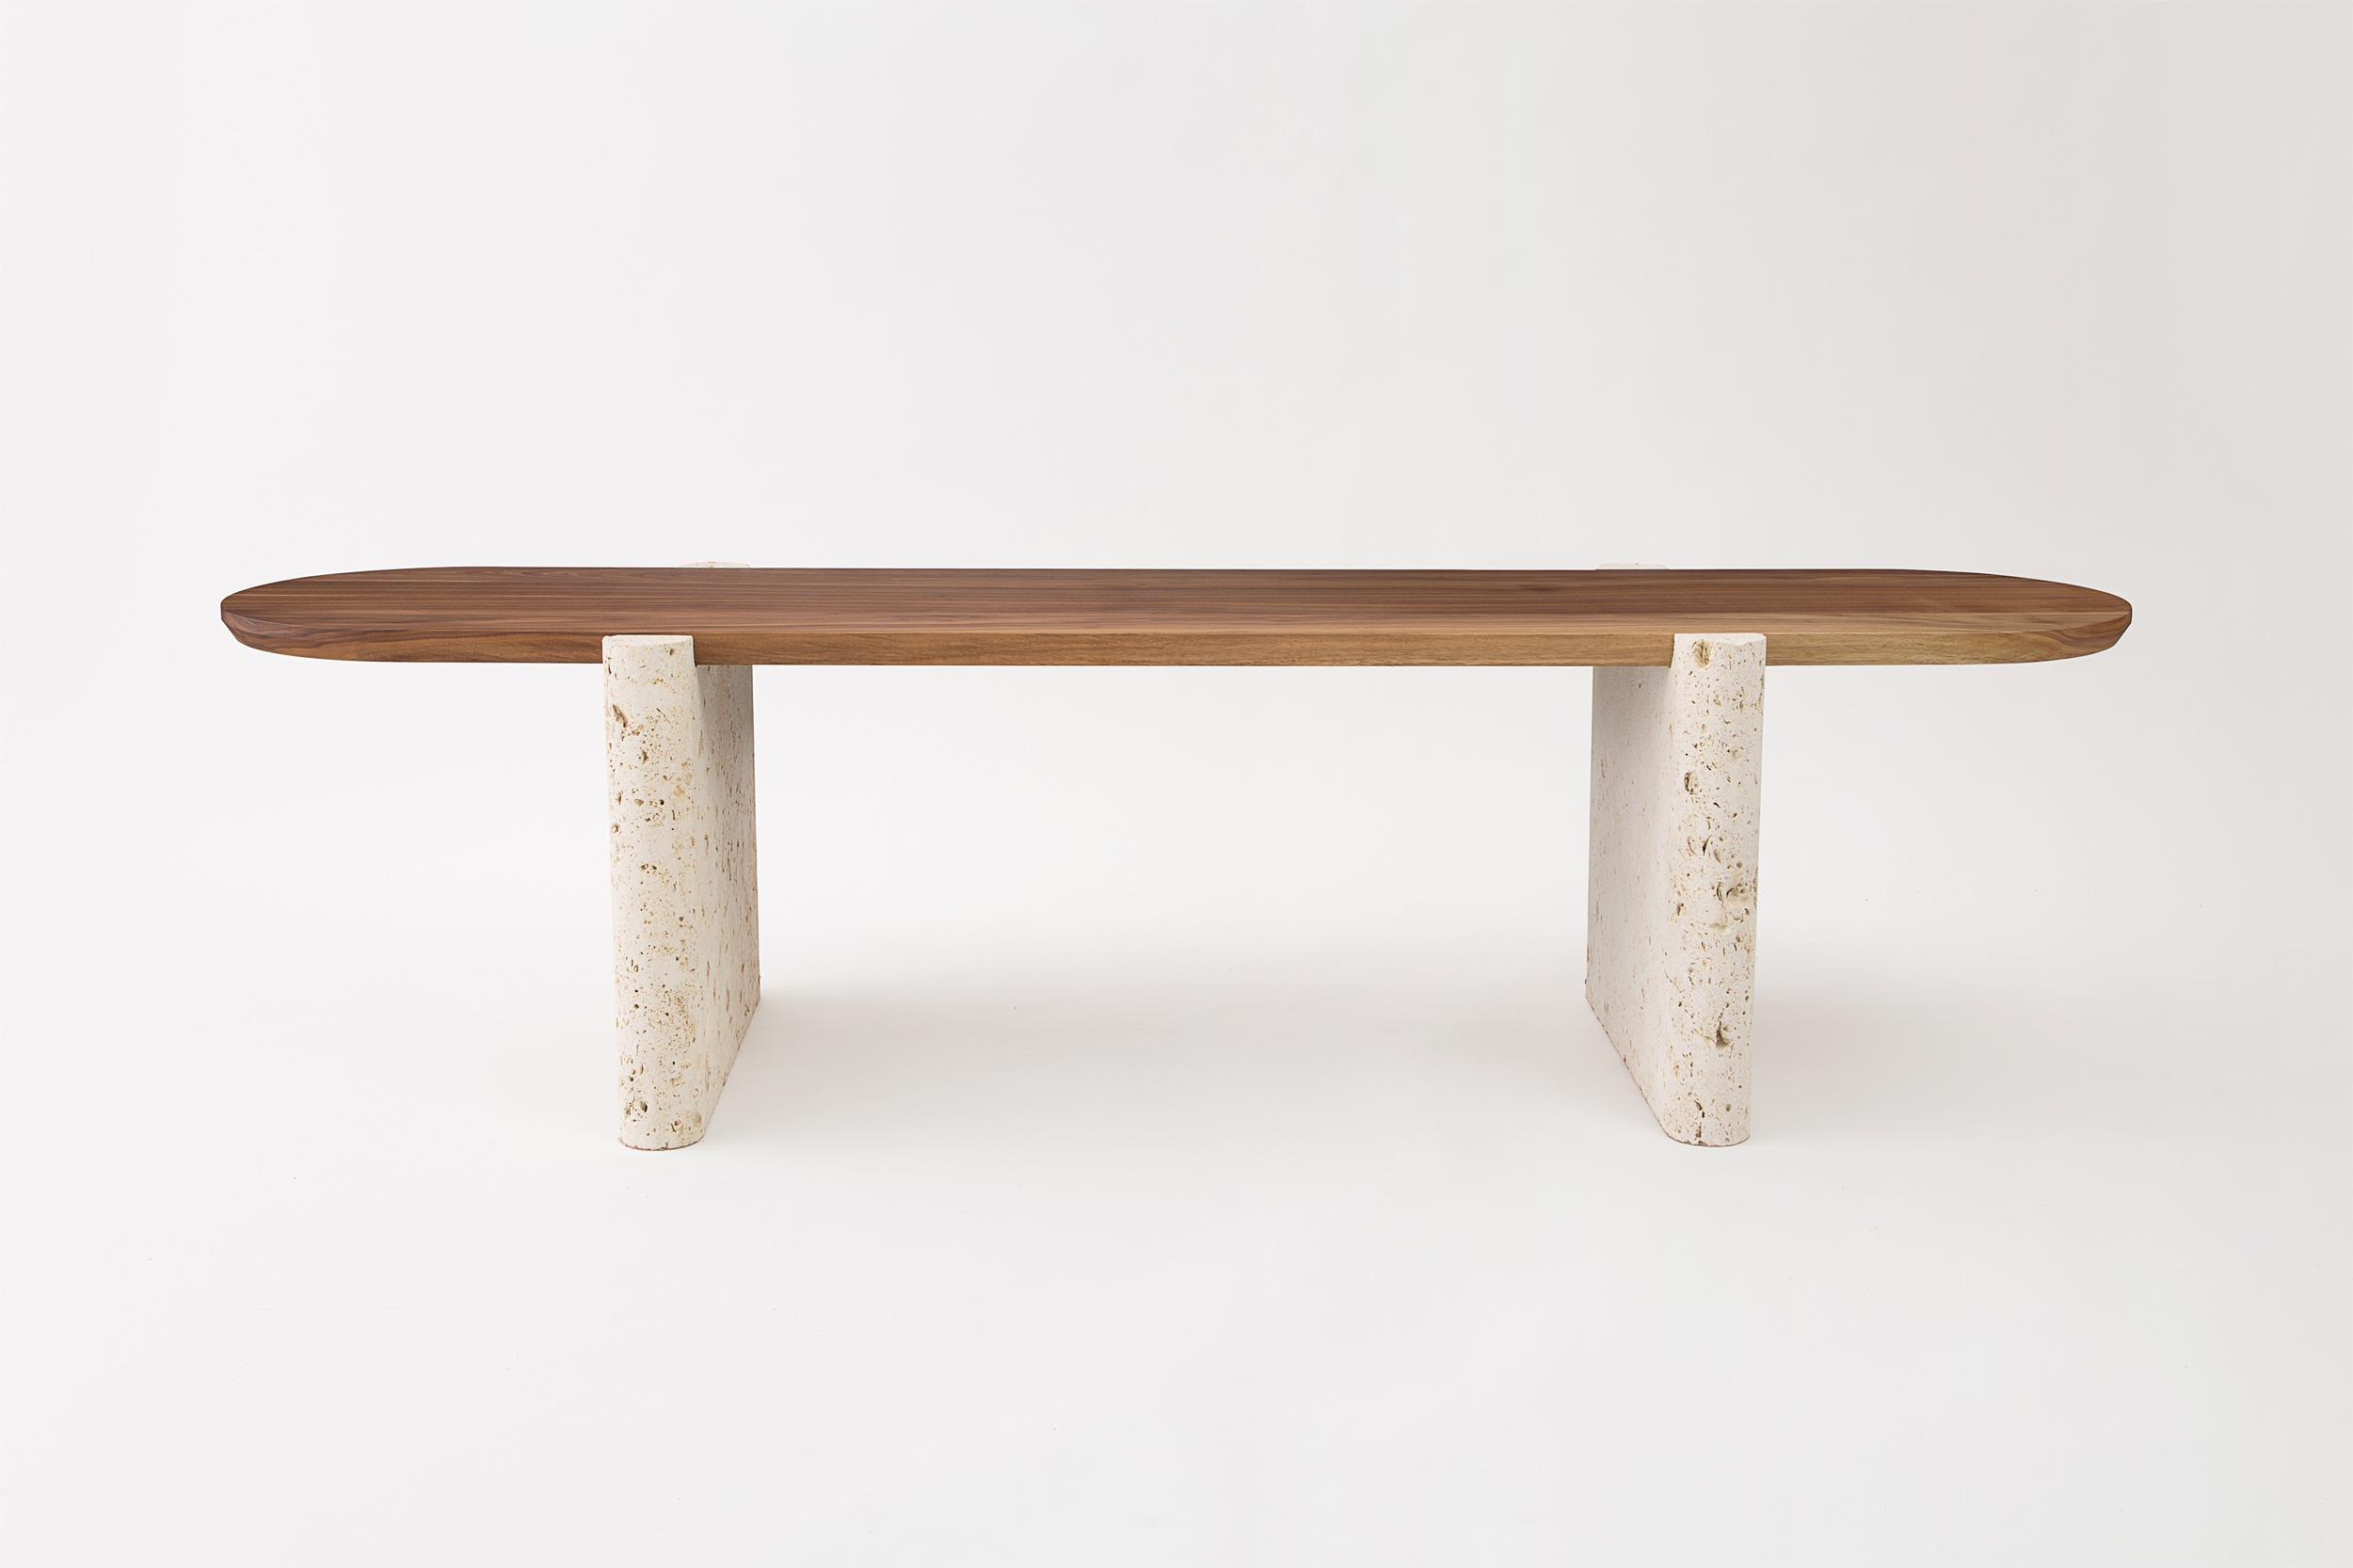 YUCCASTUFF_LAVACA TABLE_VIEW 004.jpg